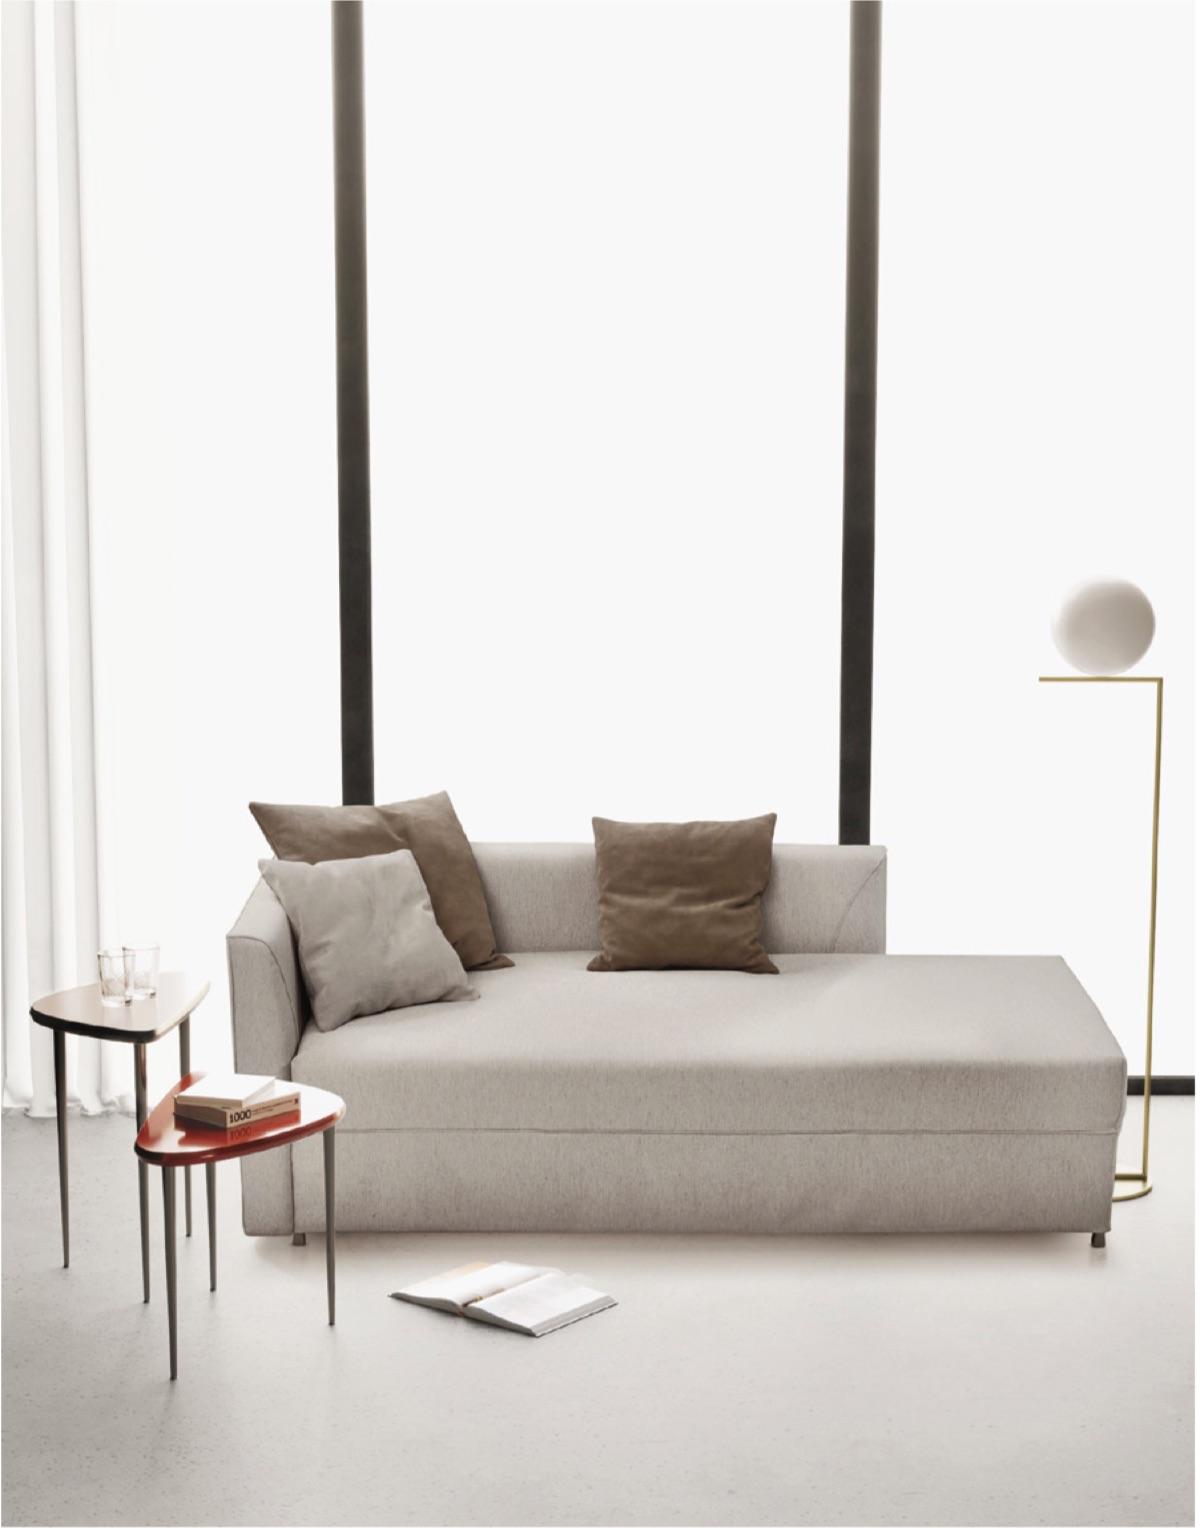 SBD 123 Modern Day Bed